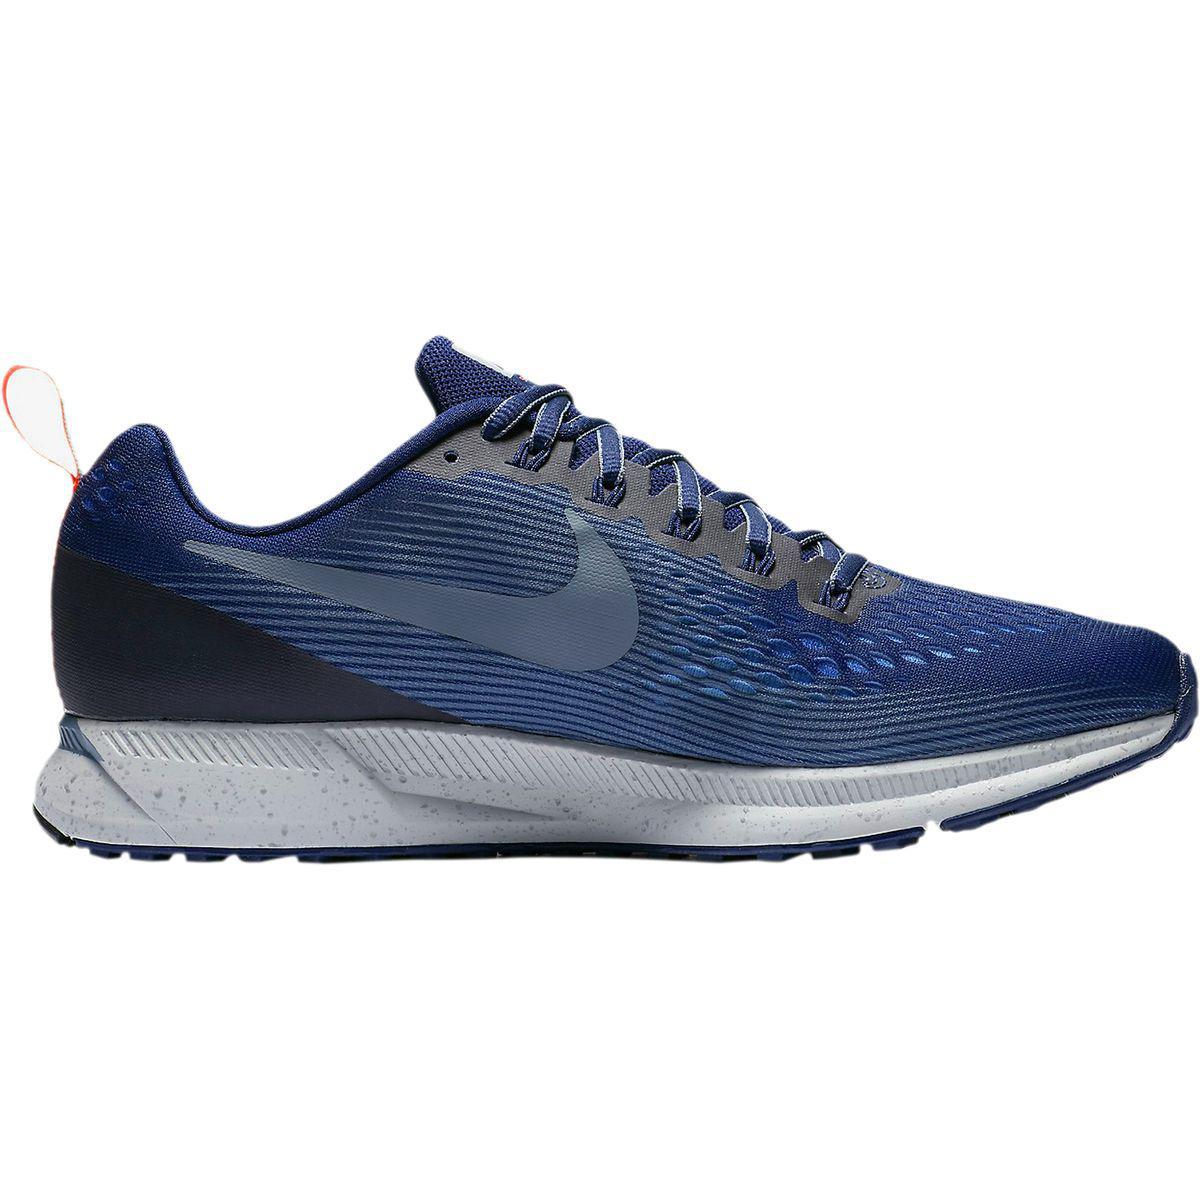 933b2167d2104 Lyst - Nike Air Zoom Pegasus 34 Shield Running Shoe in Blue for Men